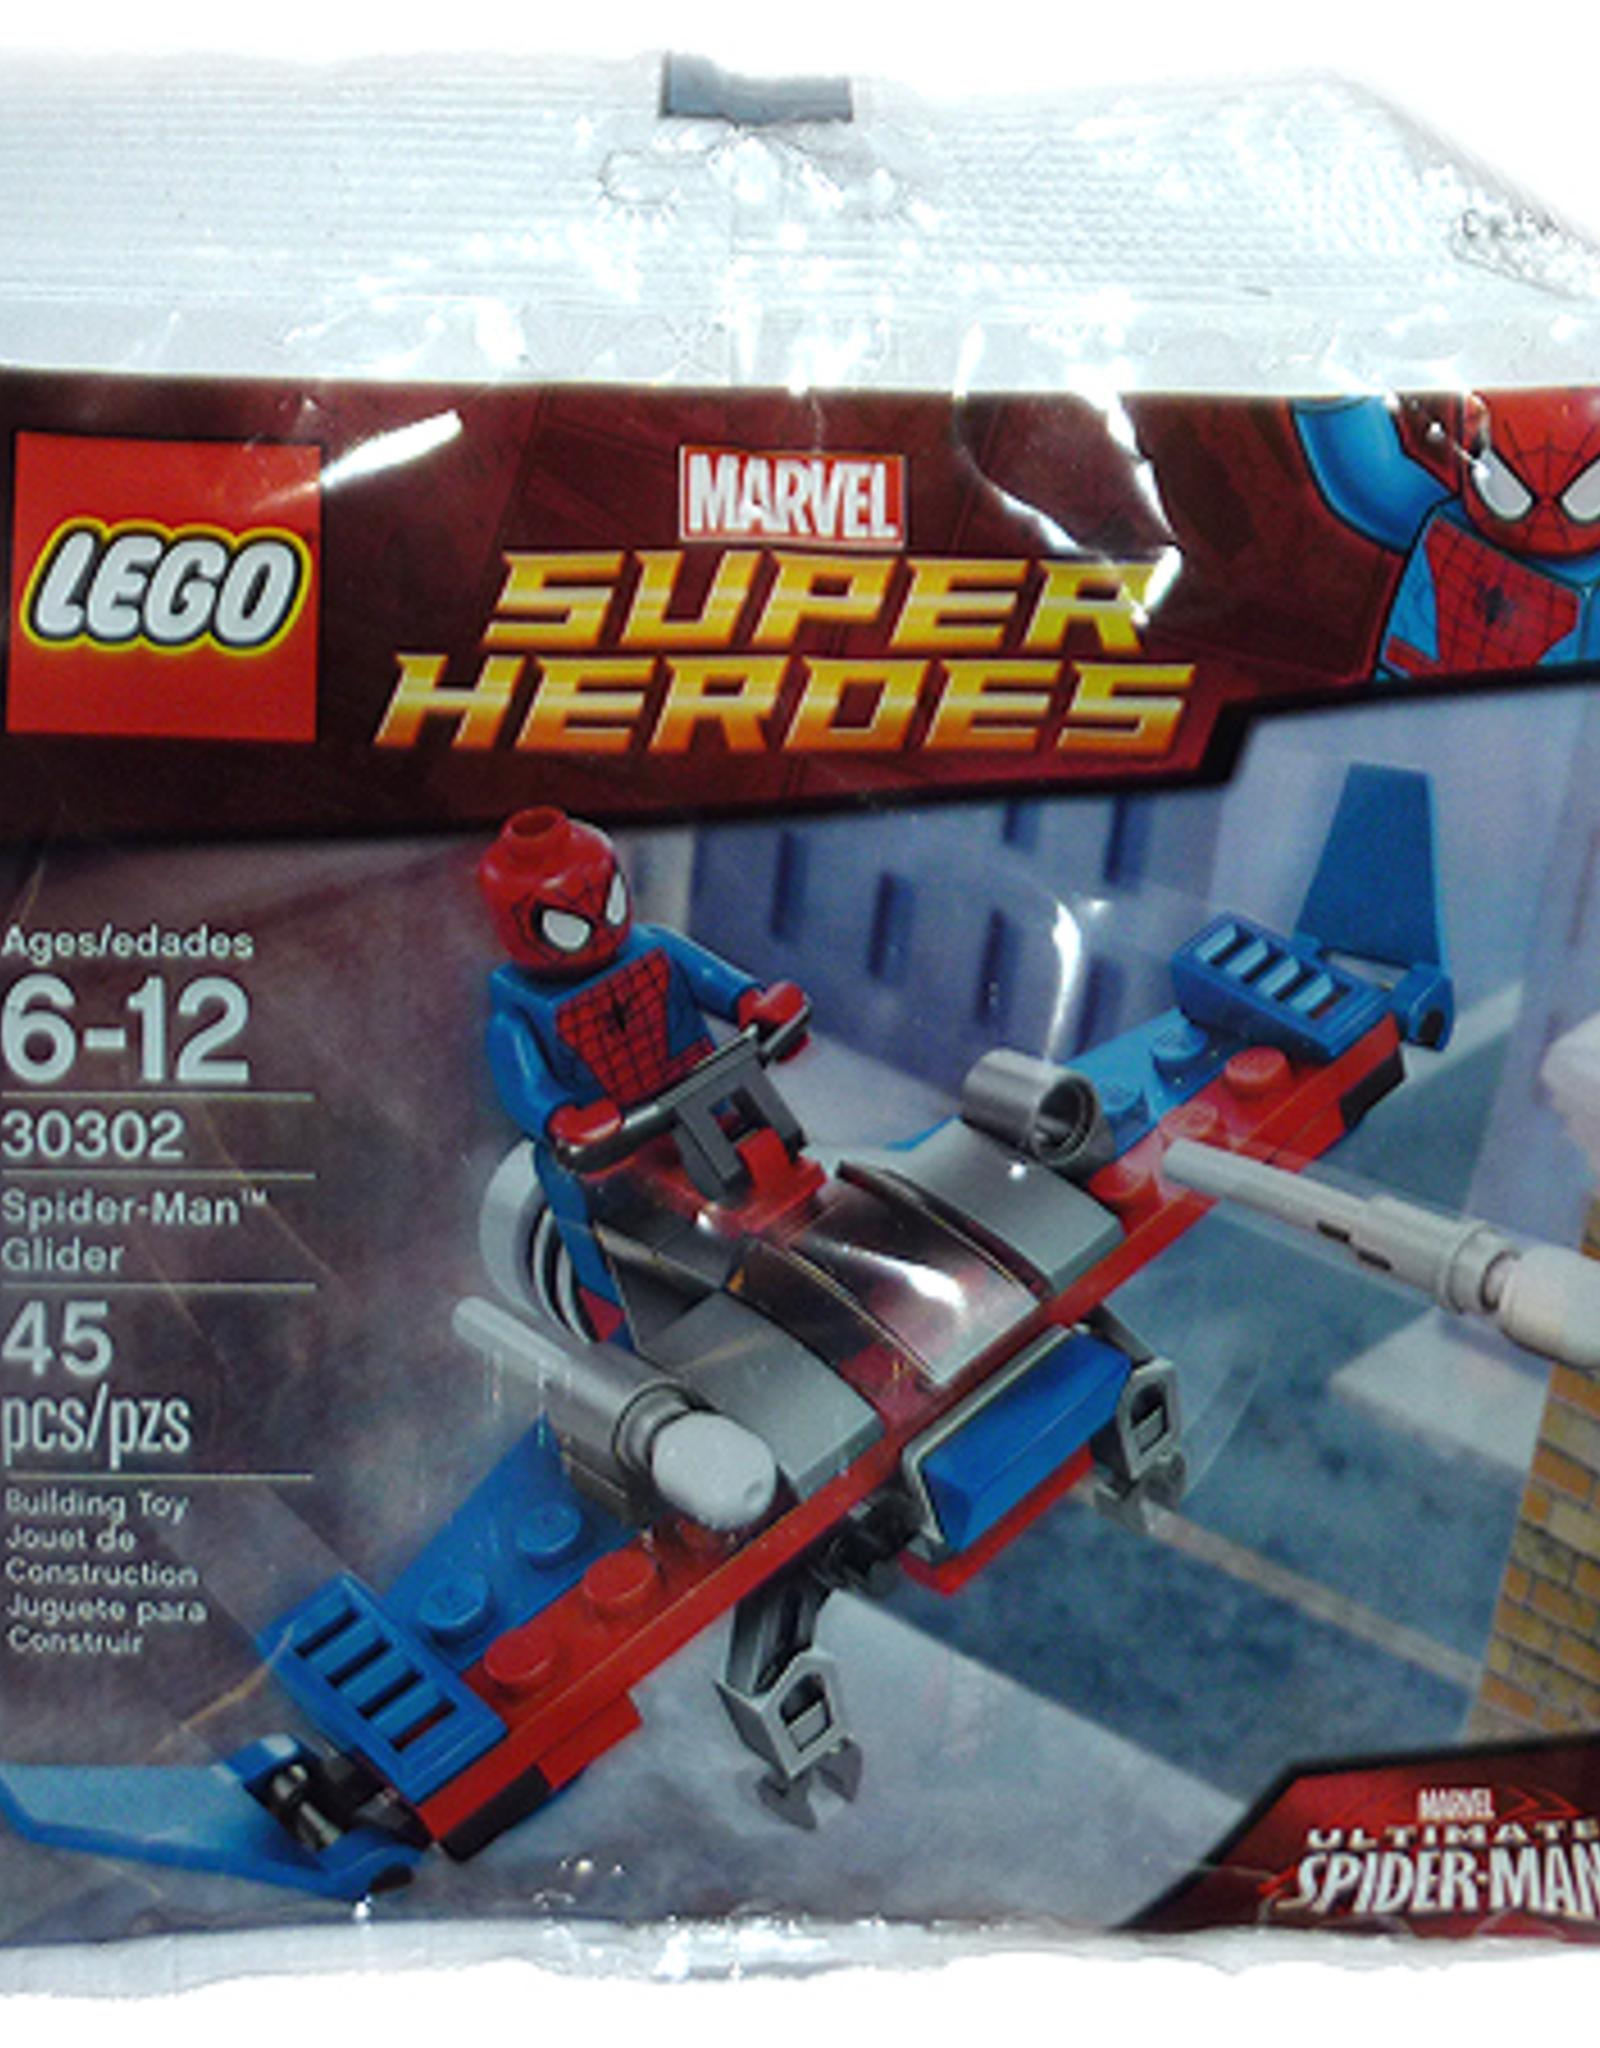 LEGO LEGO 30302 Spider-Man Glider SUPER HEROES